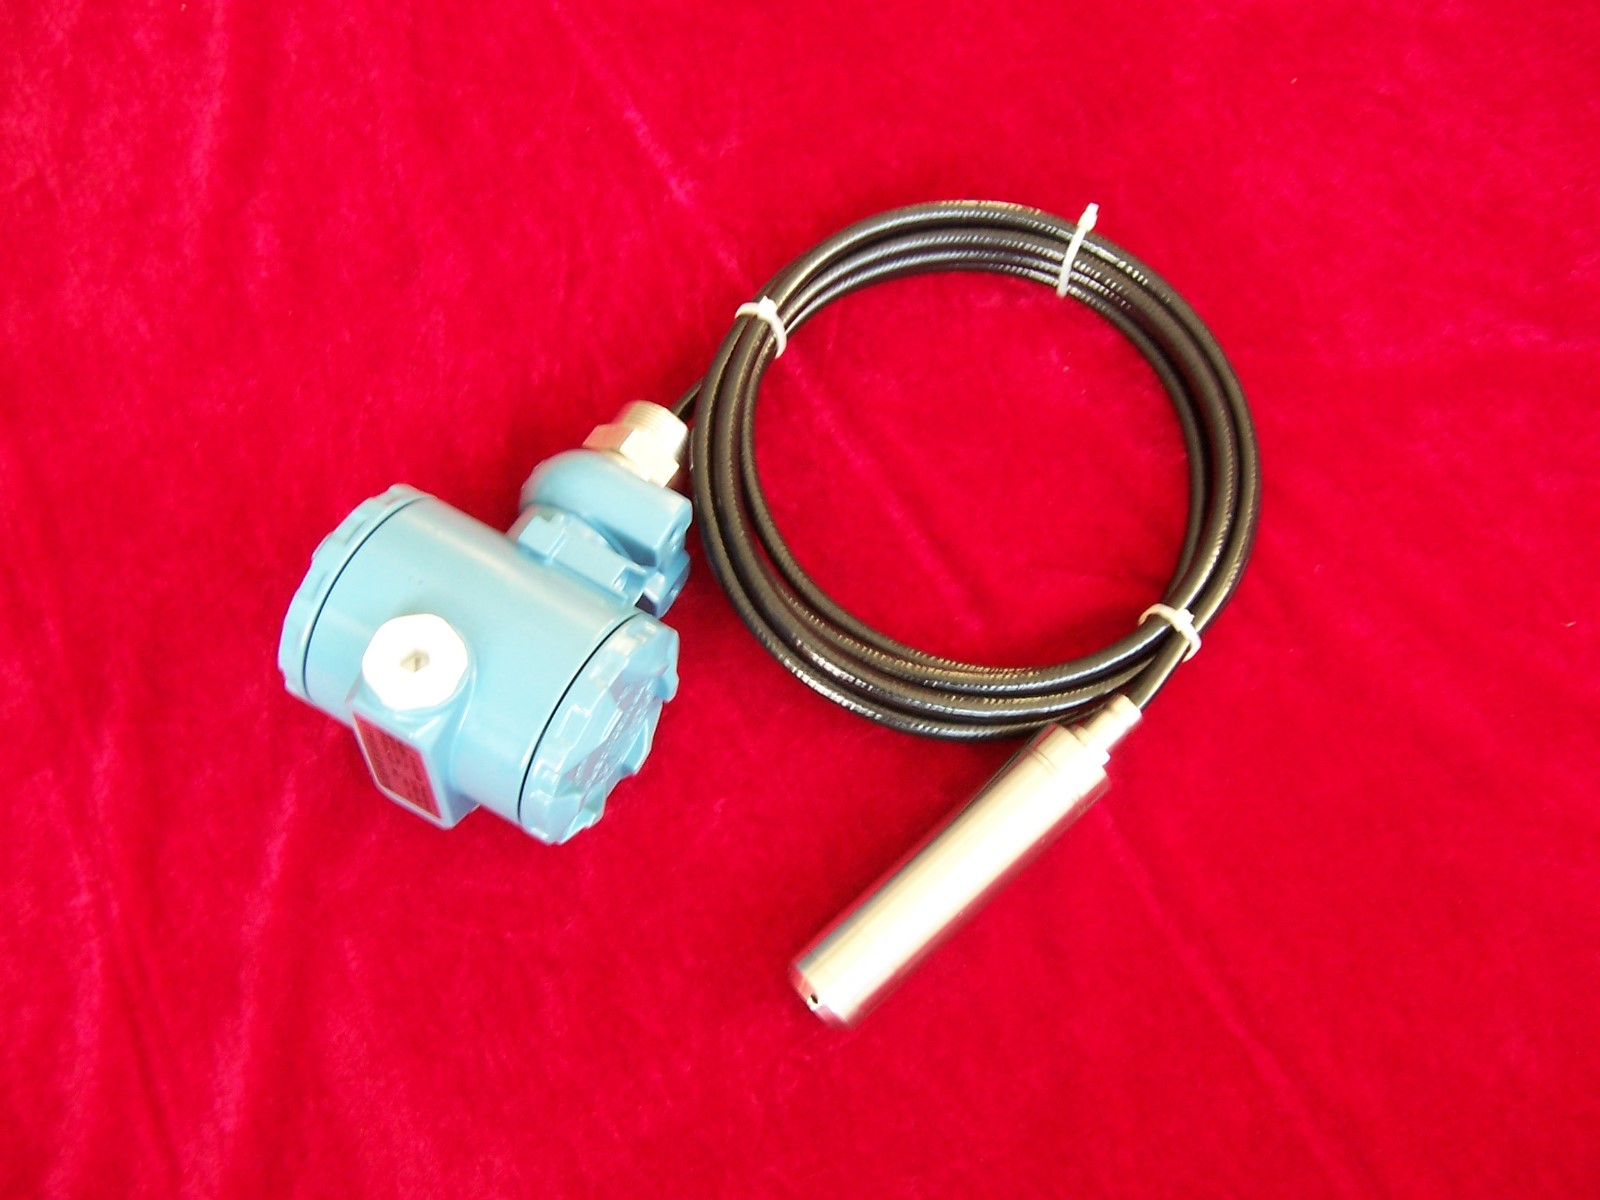 PMC2288液位变送器|压力、差压变送器-天津市恒河仪表有限公司